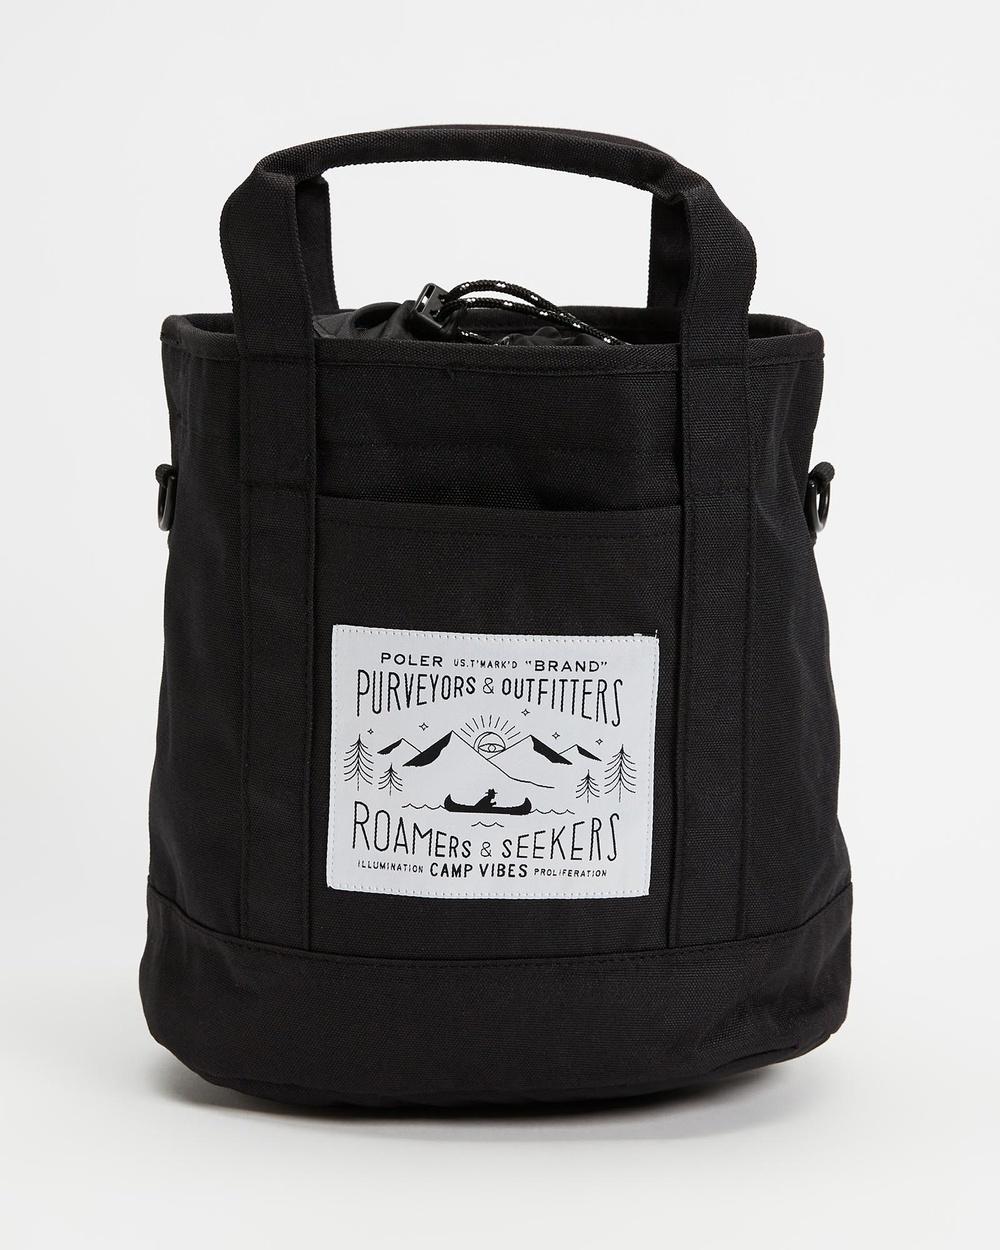 Poler Mini Tote Bags Black